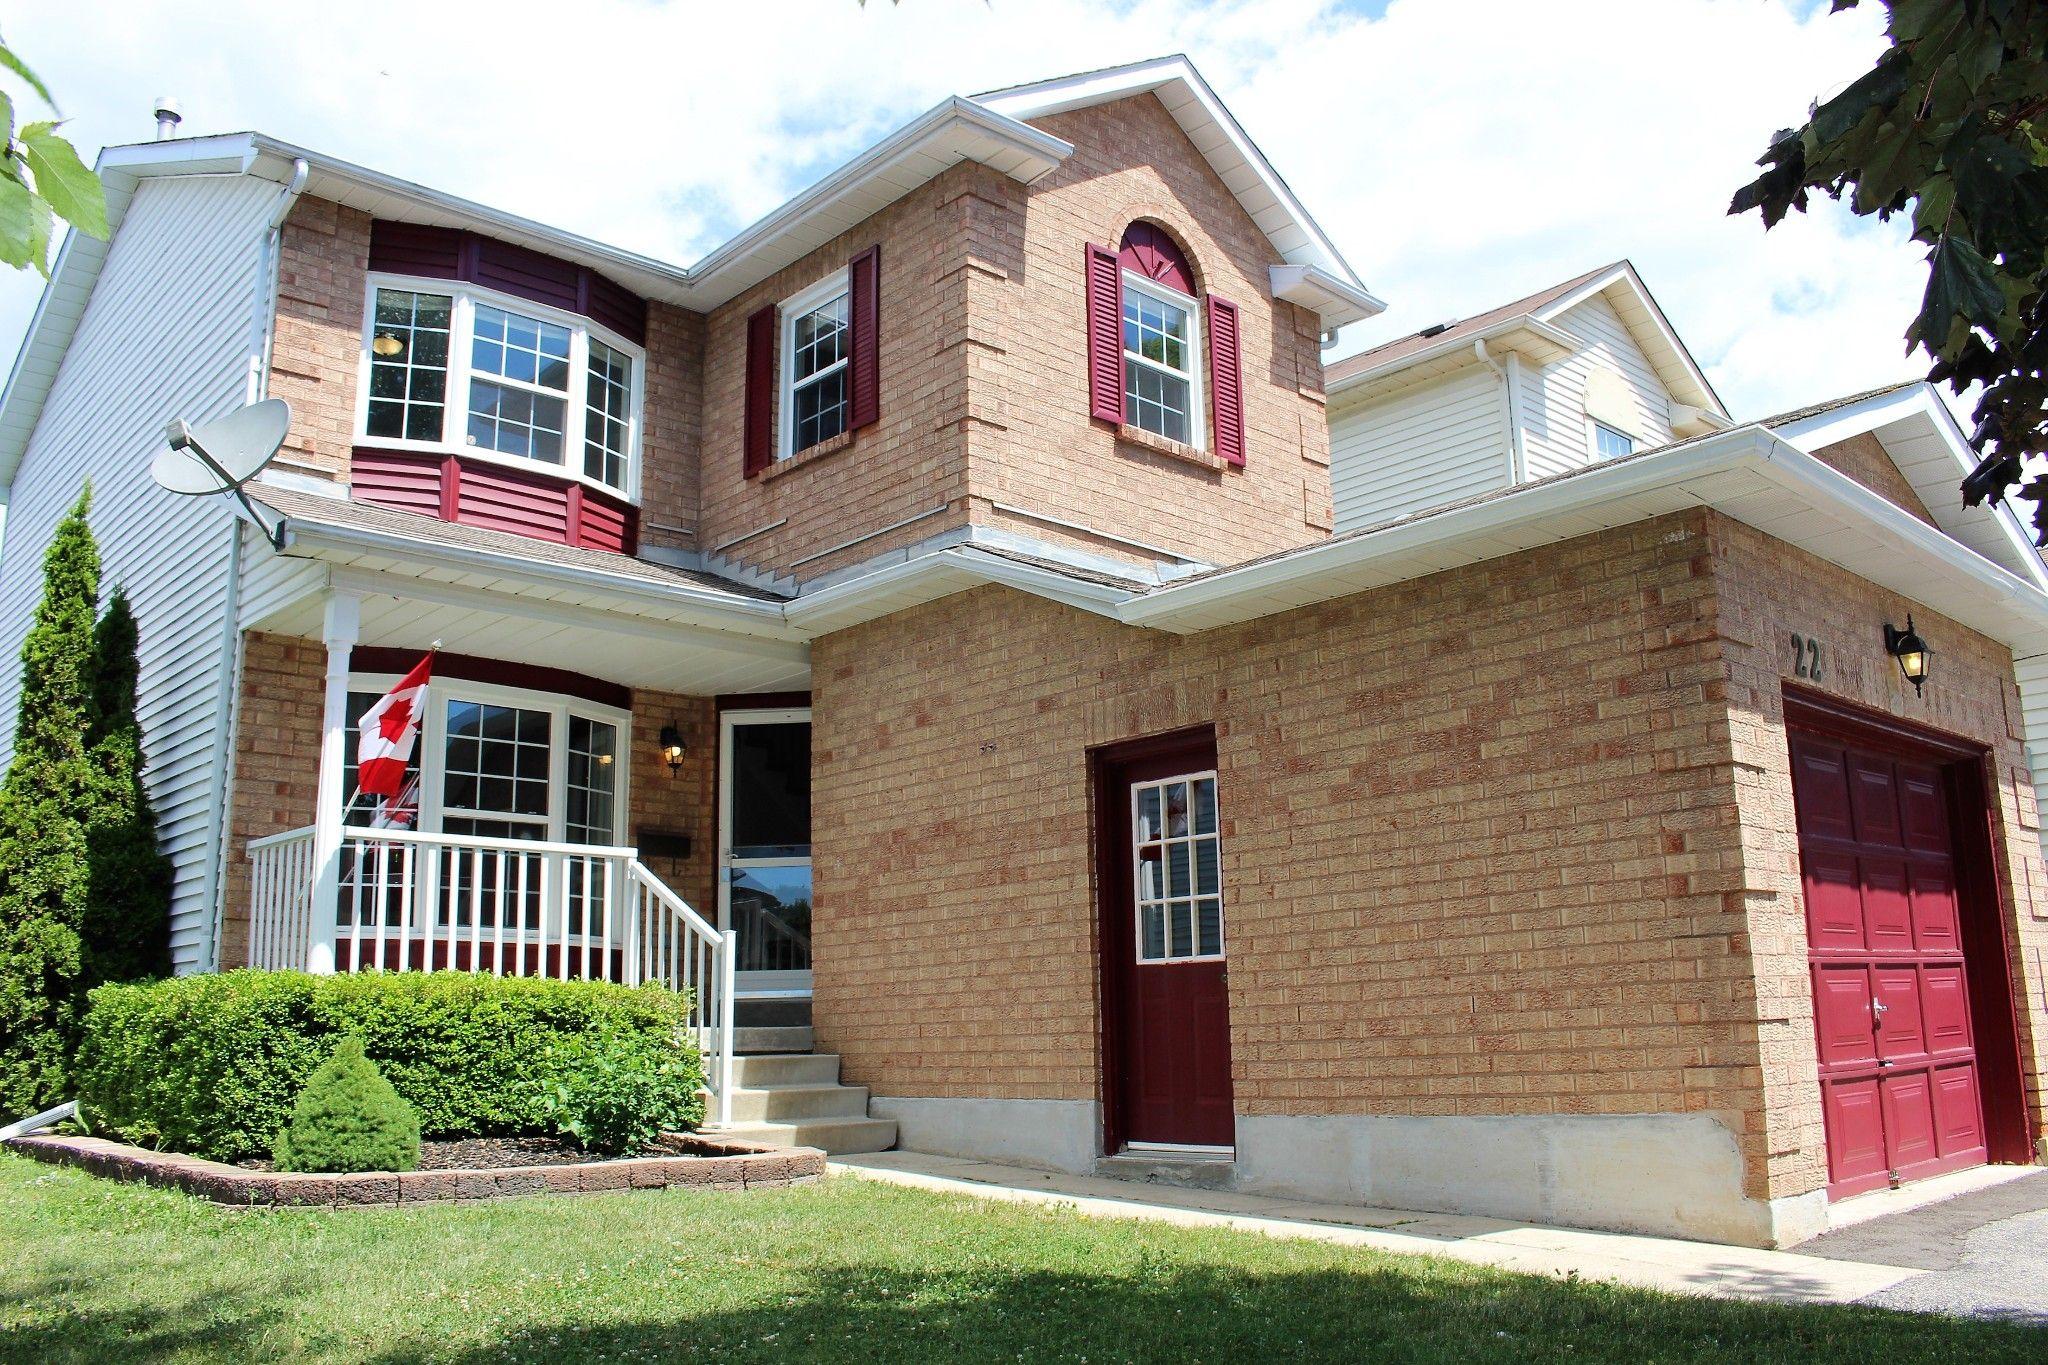 Main Photo: 22 Burnham Boulevard in Cobourg: House for sale : MLS®# 275167